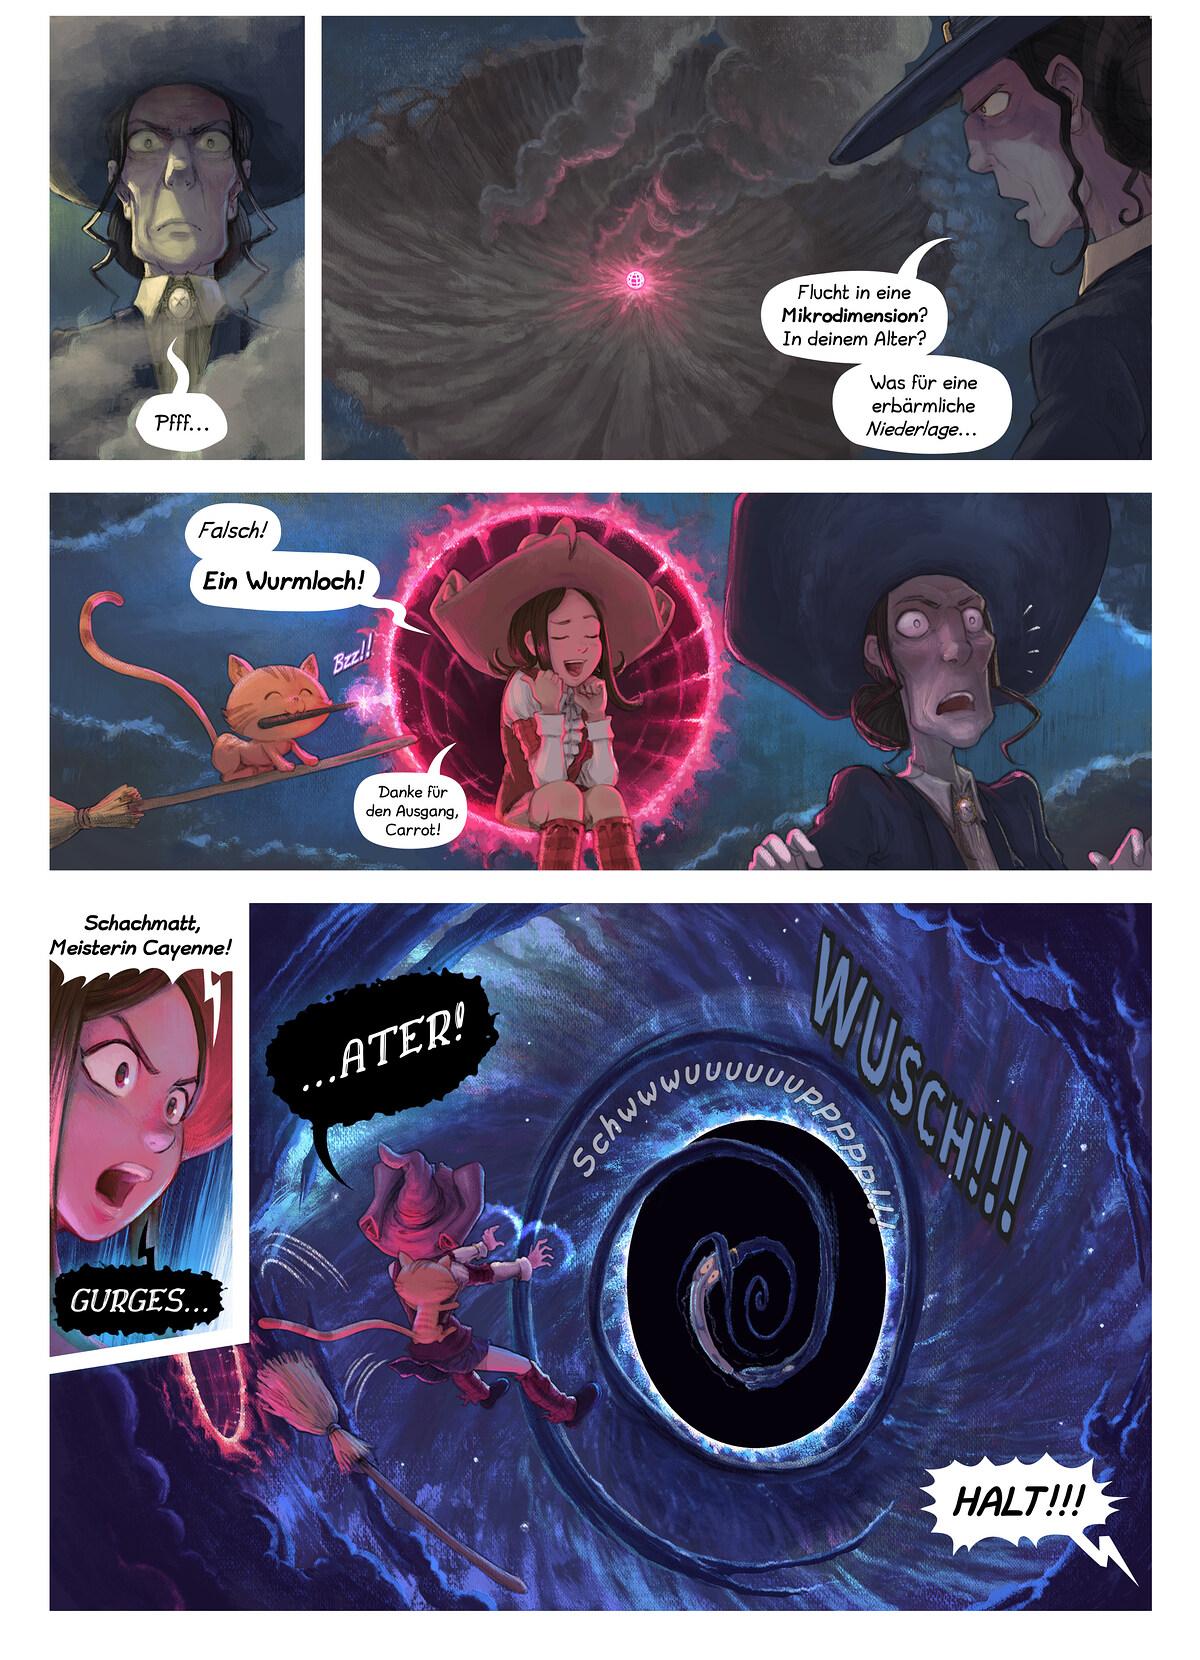 Episode 31: Der Kampf, Page 5